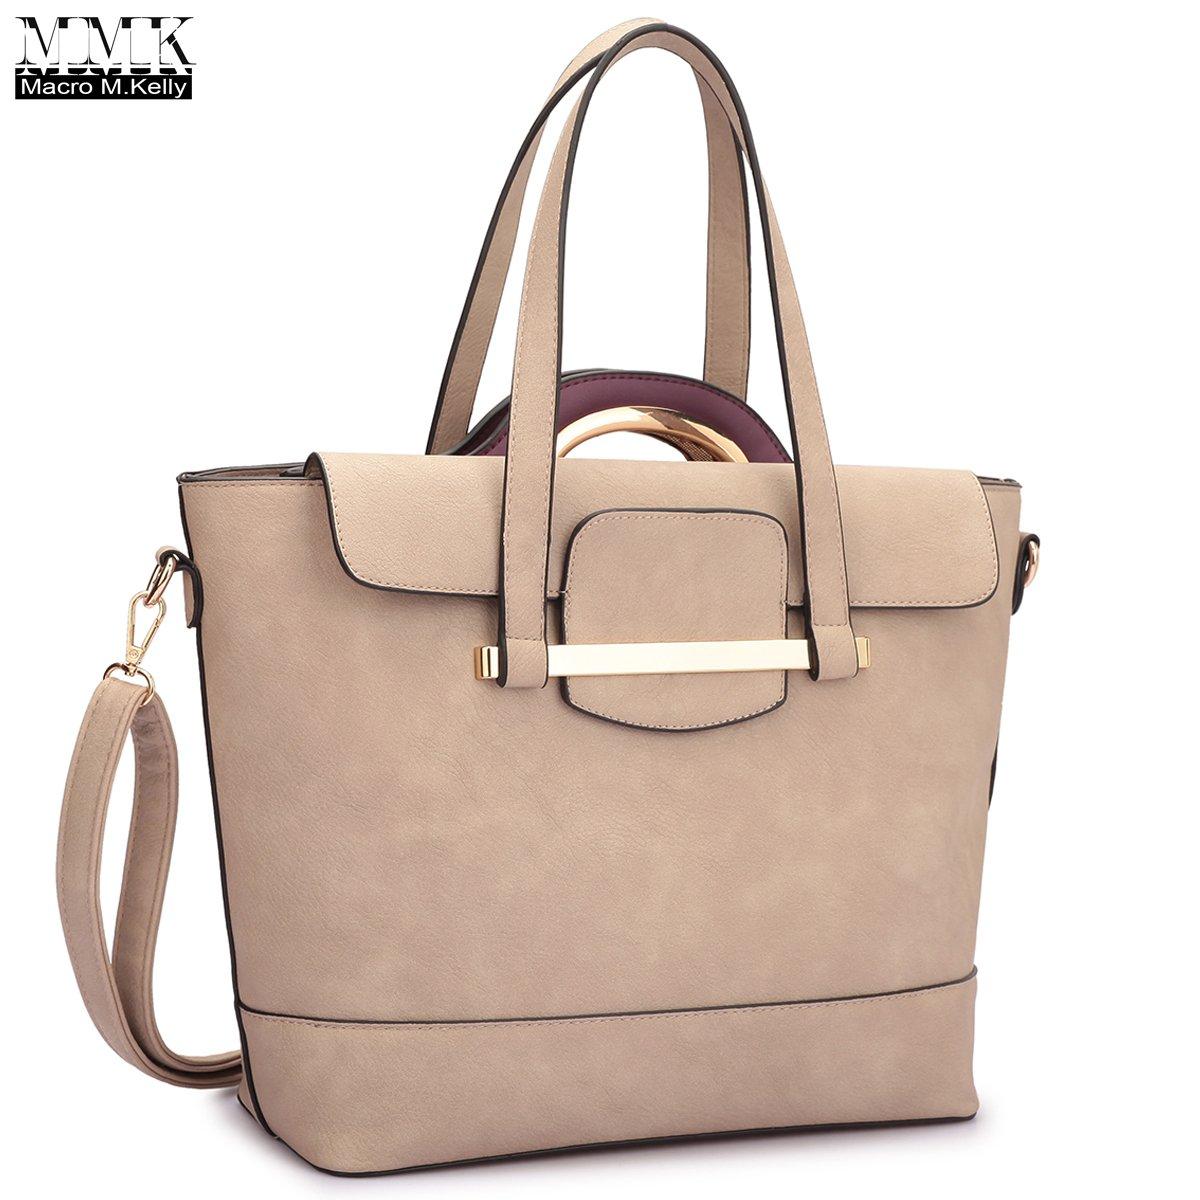 MMK collection Fall~winter color handbag~ New fashion 2 in one Satchel handbag and Tote bag set~beautiful handbag~Perfect Designer Set(7057-Stone/Purple)